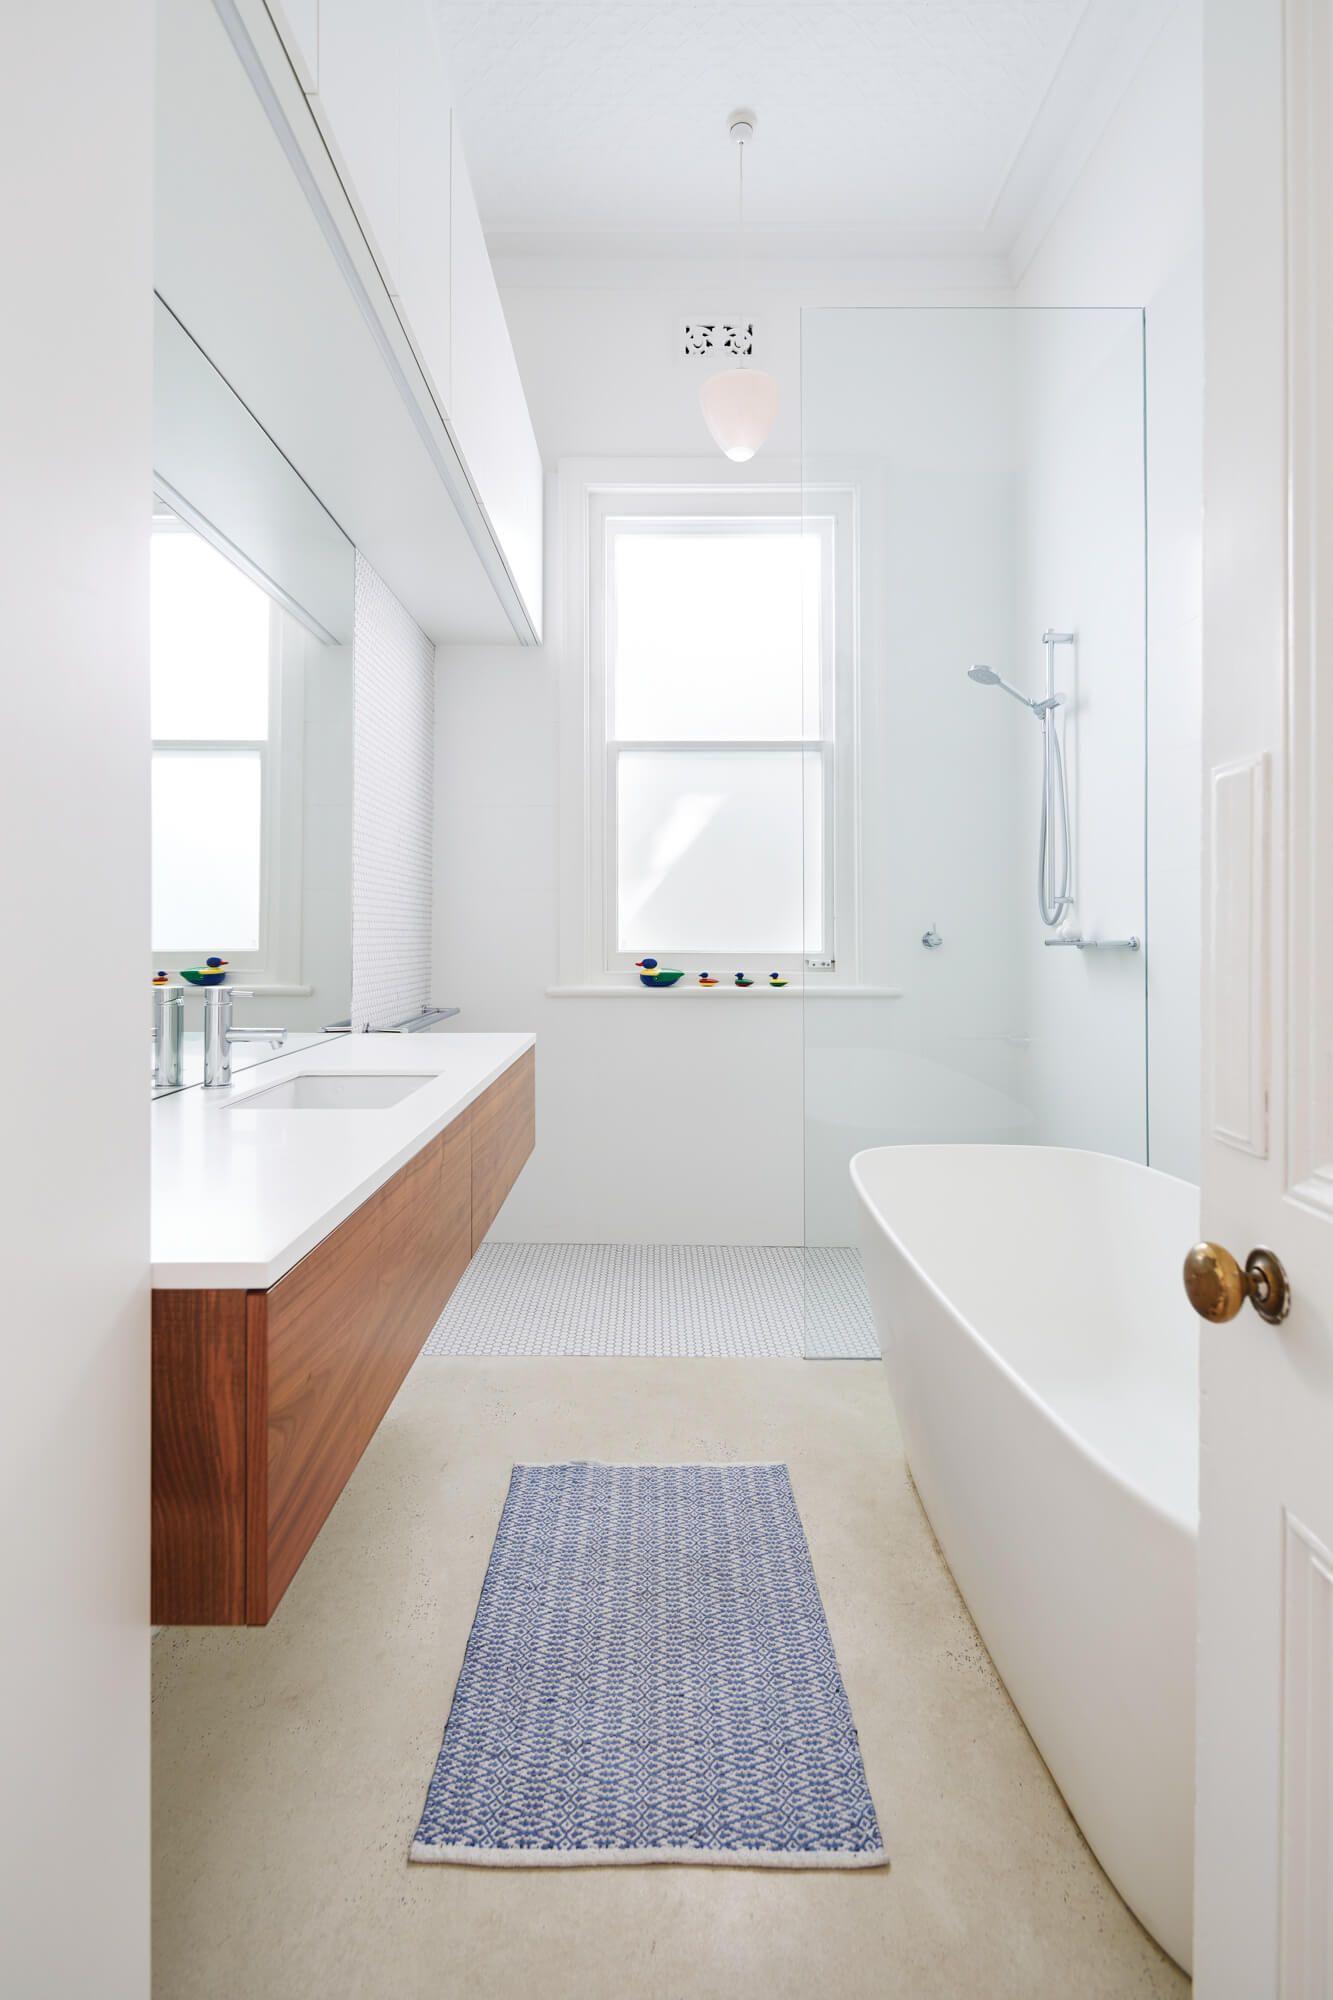 Australian Federation Bungalow Home Renovation Says Goodbye To Outdoor Toilet Bathroom Renovations Bathroom Renovation Home Renovation